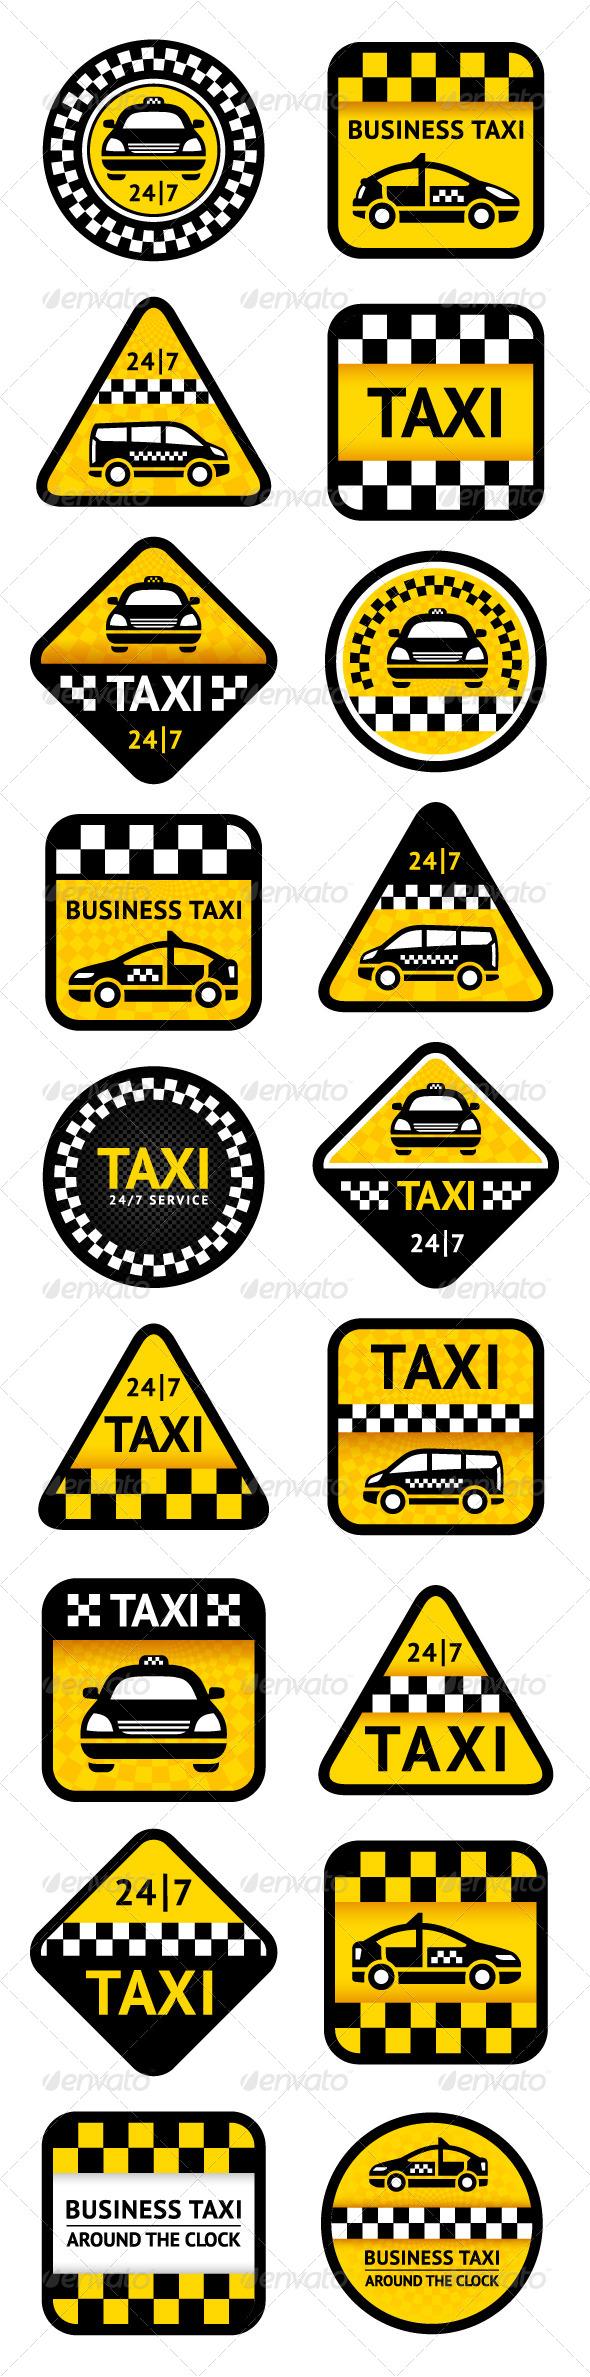 GraphicRiver Taxi Set 18 pcs 4124646